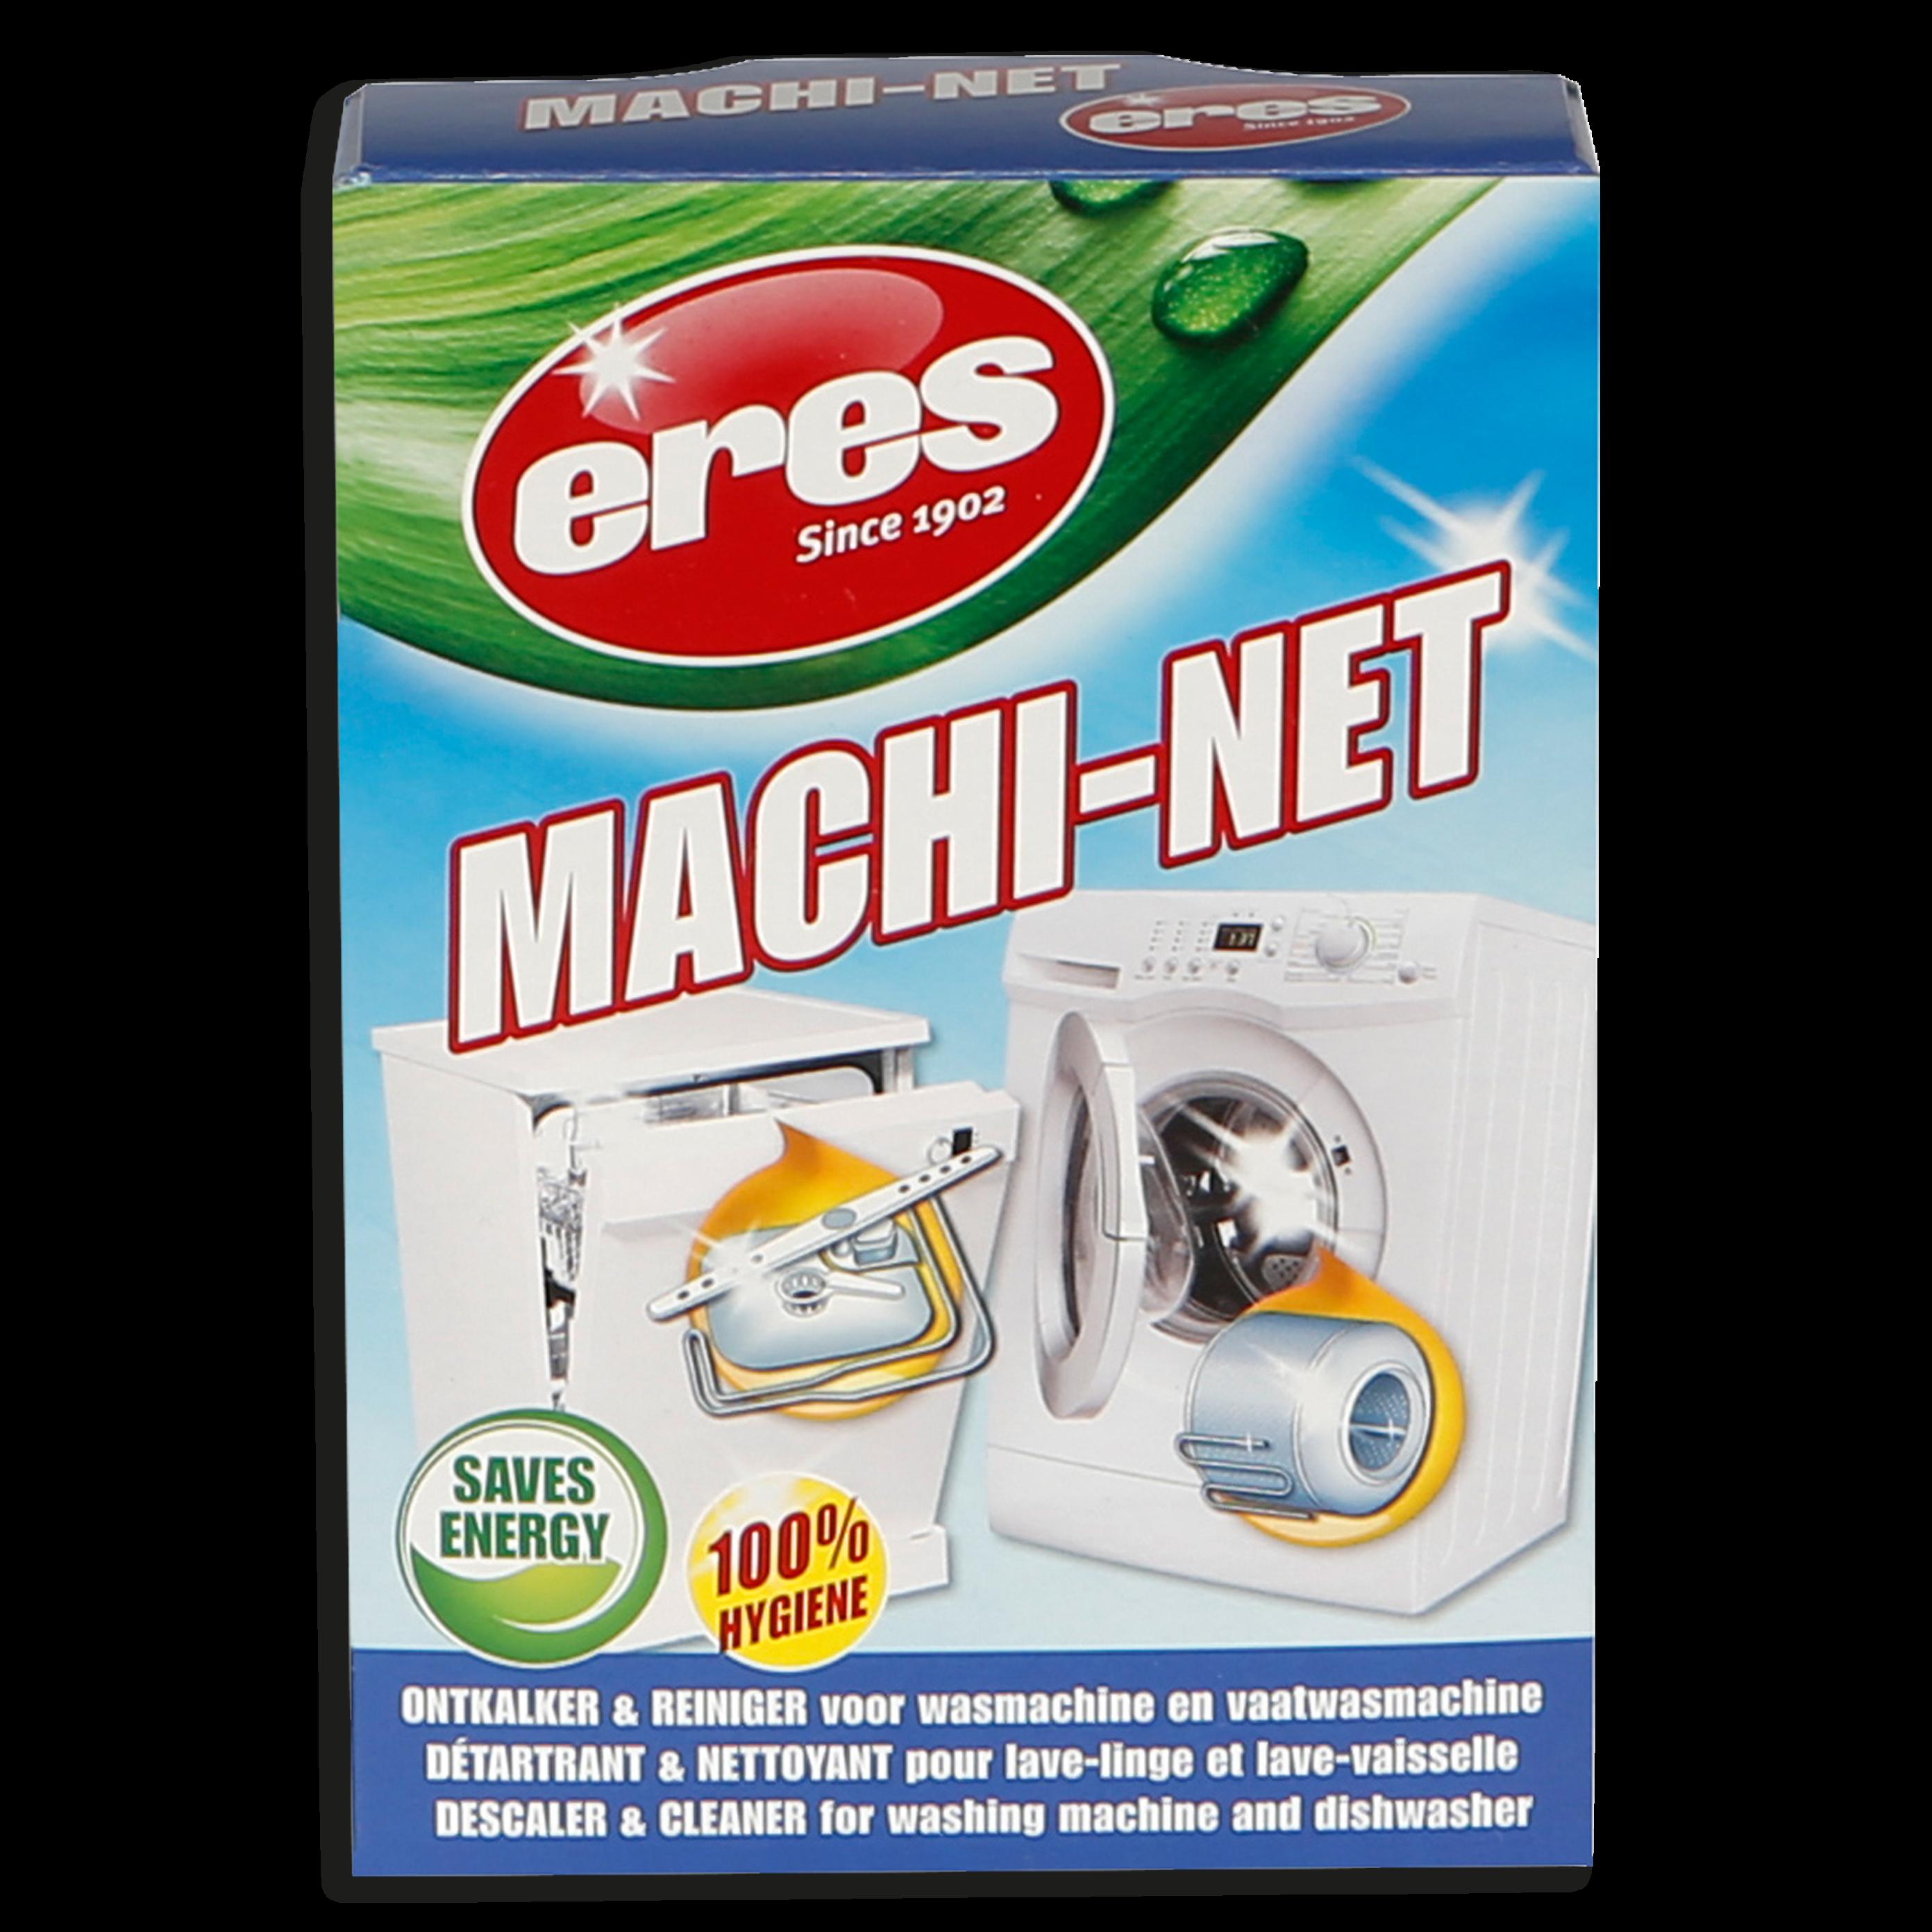 MACHI-NET